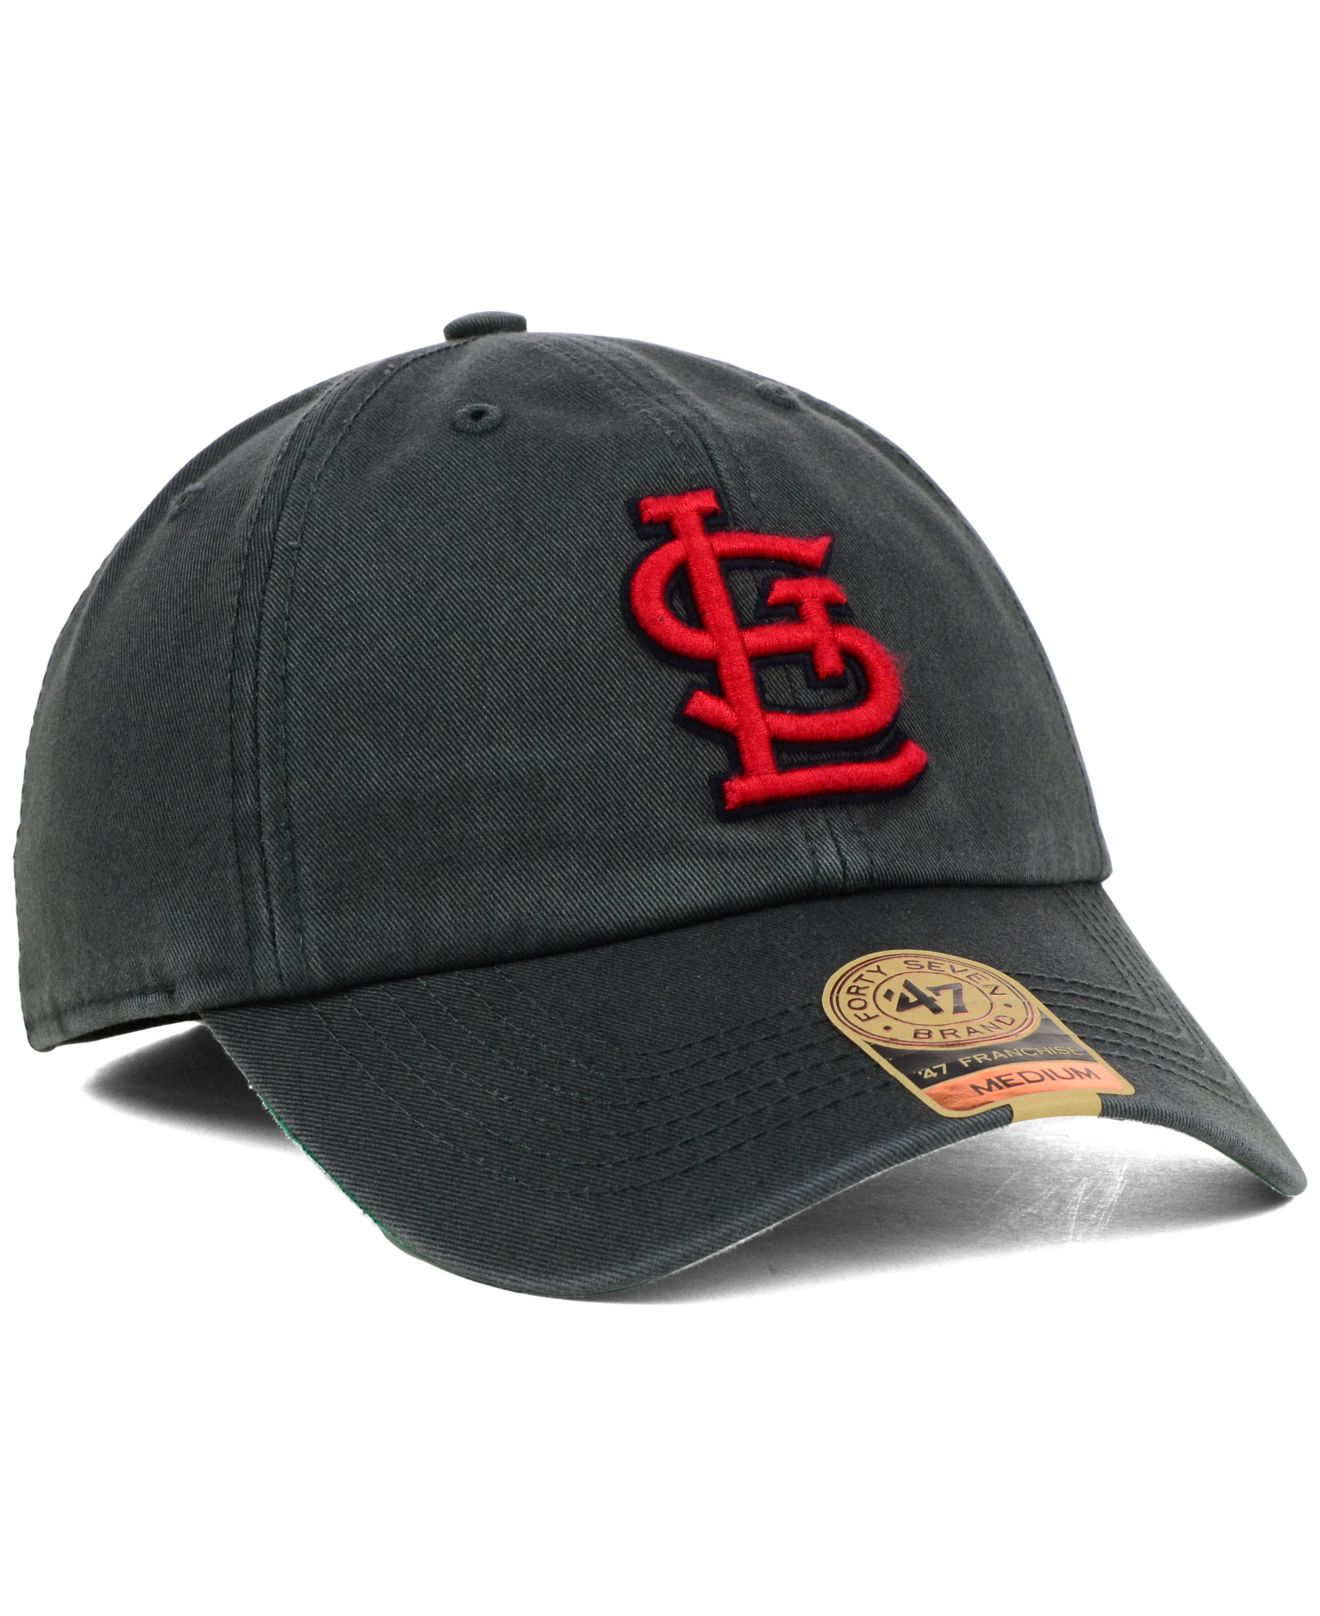 76c244822 Lyst - 47 Brand St. Louis Cardinals Mlb Hot Corner Franchise Cap in ...